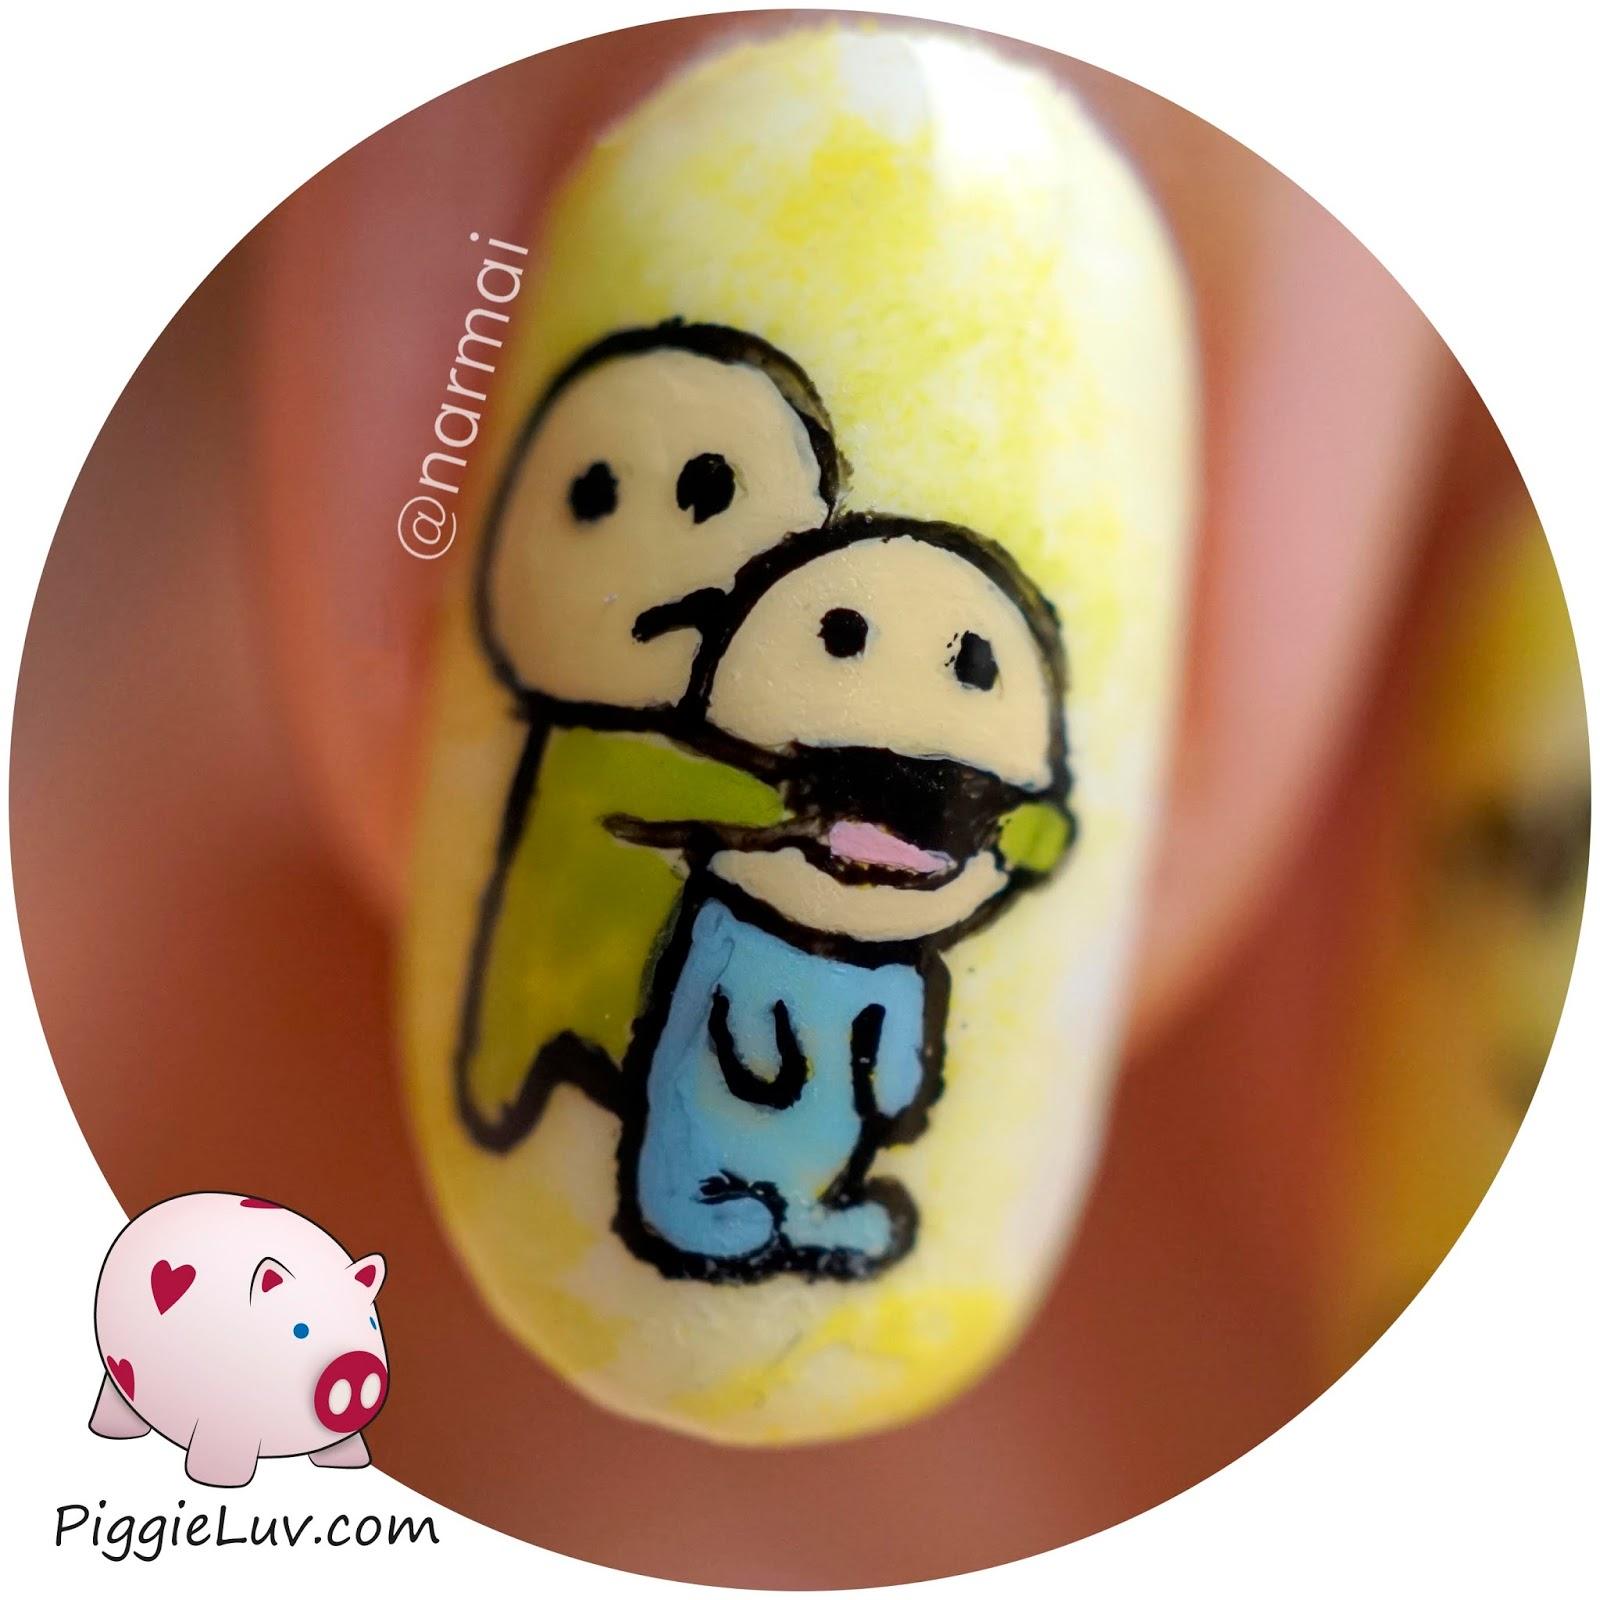 1600x1600 Piggieluv I Can Always Make You Smile! Happy Nail Art